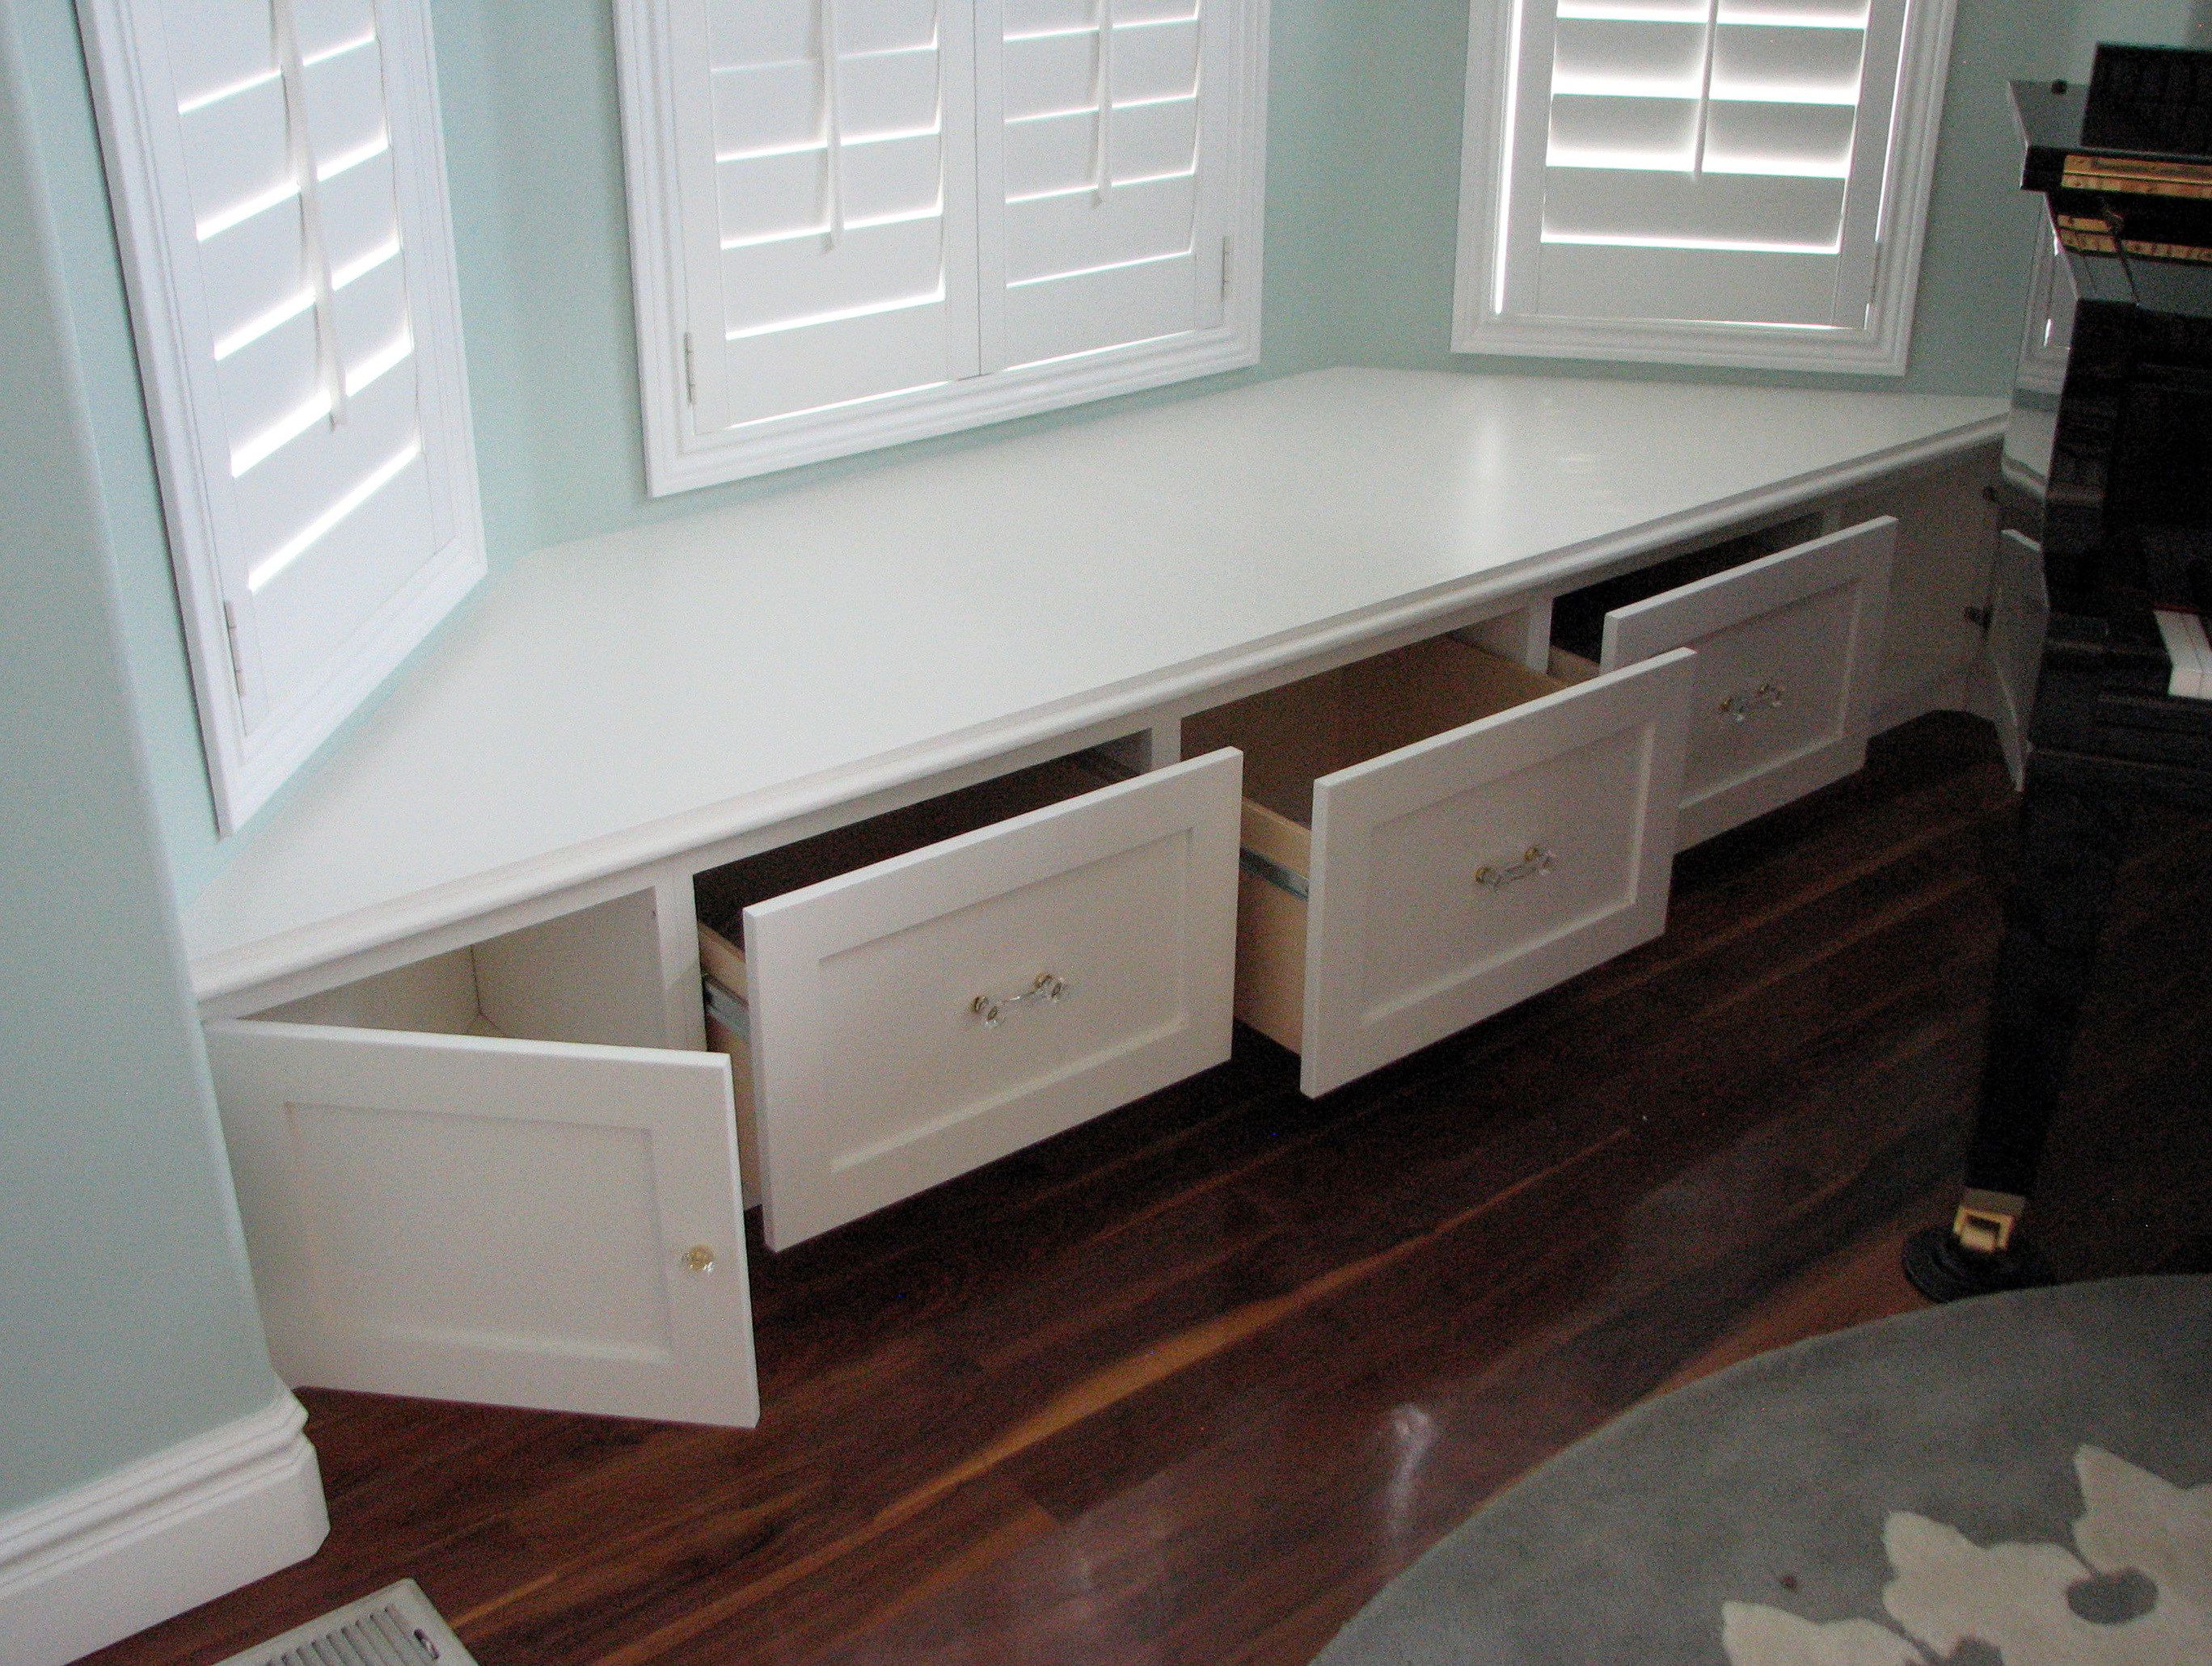 Window Bench Seats With Storage